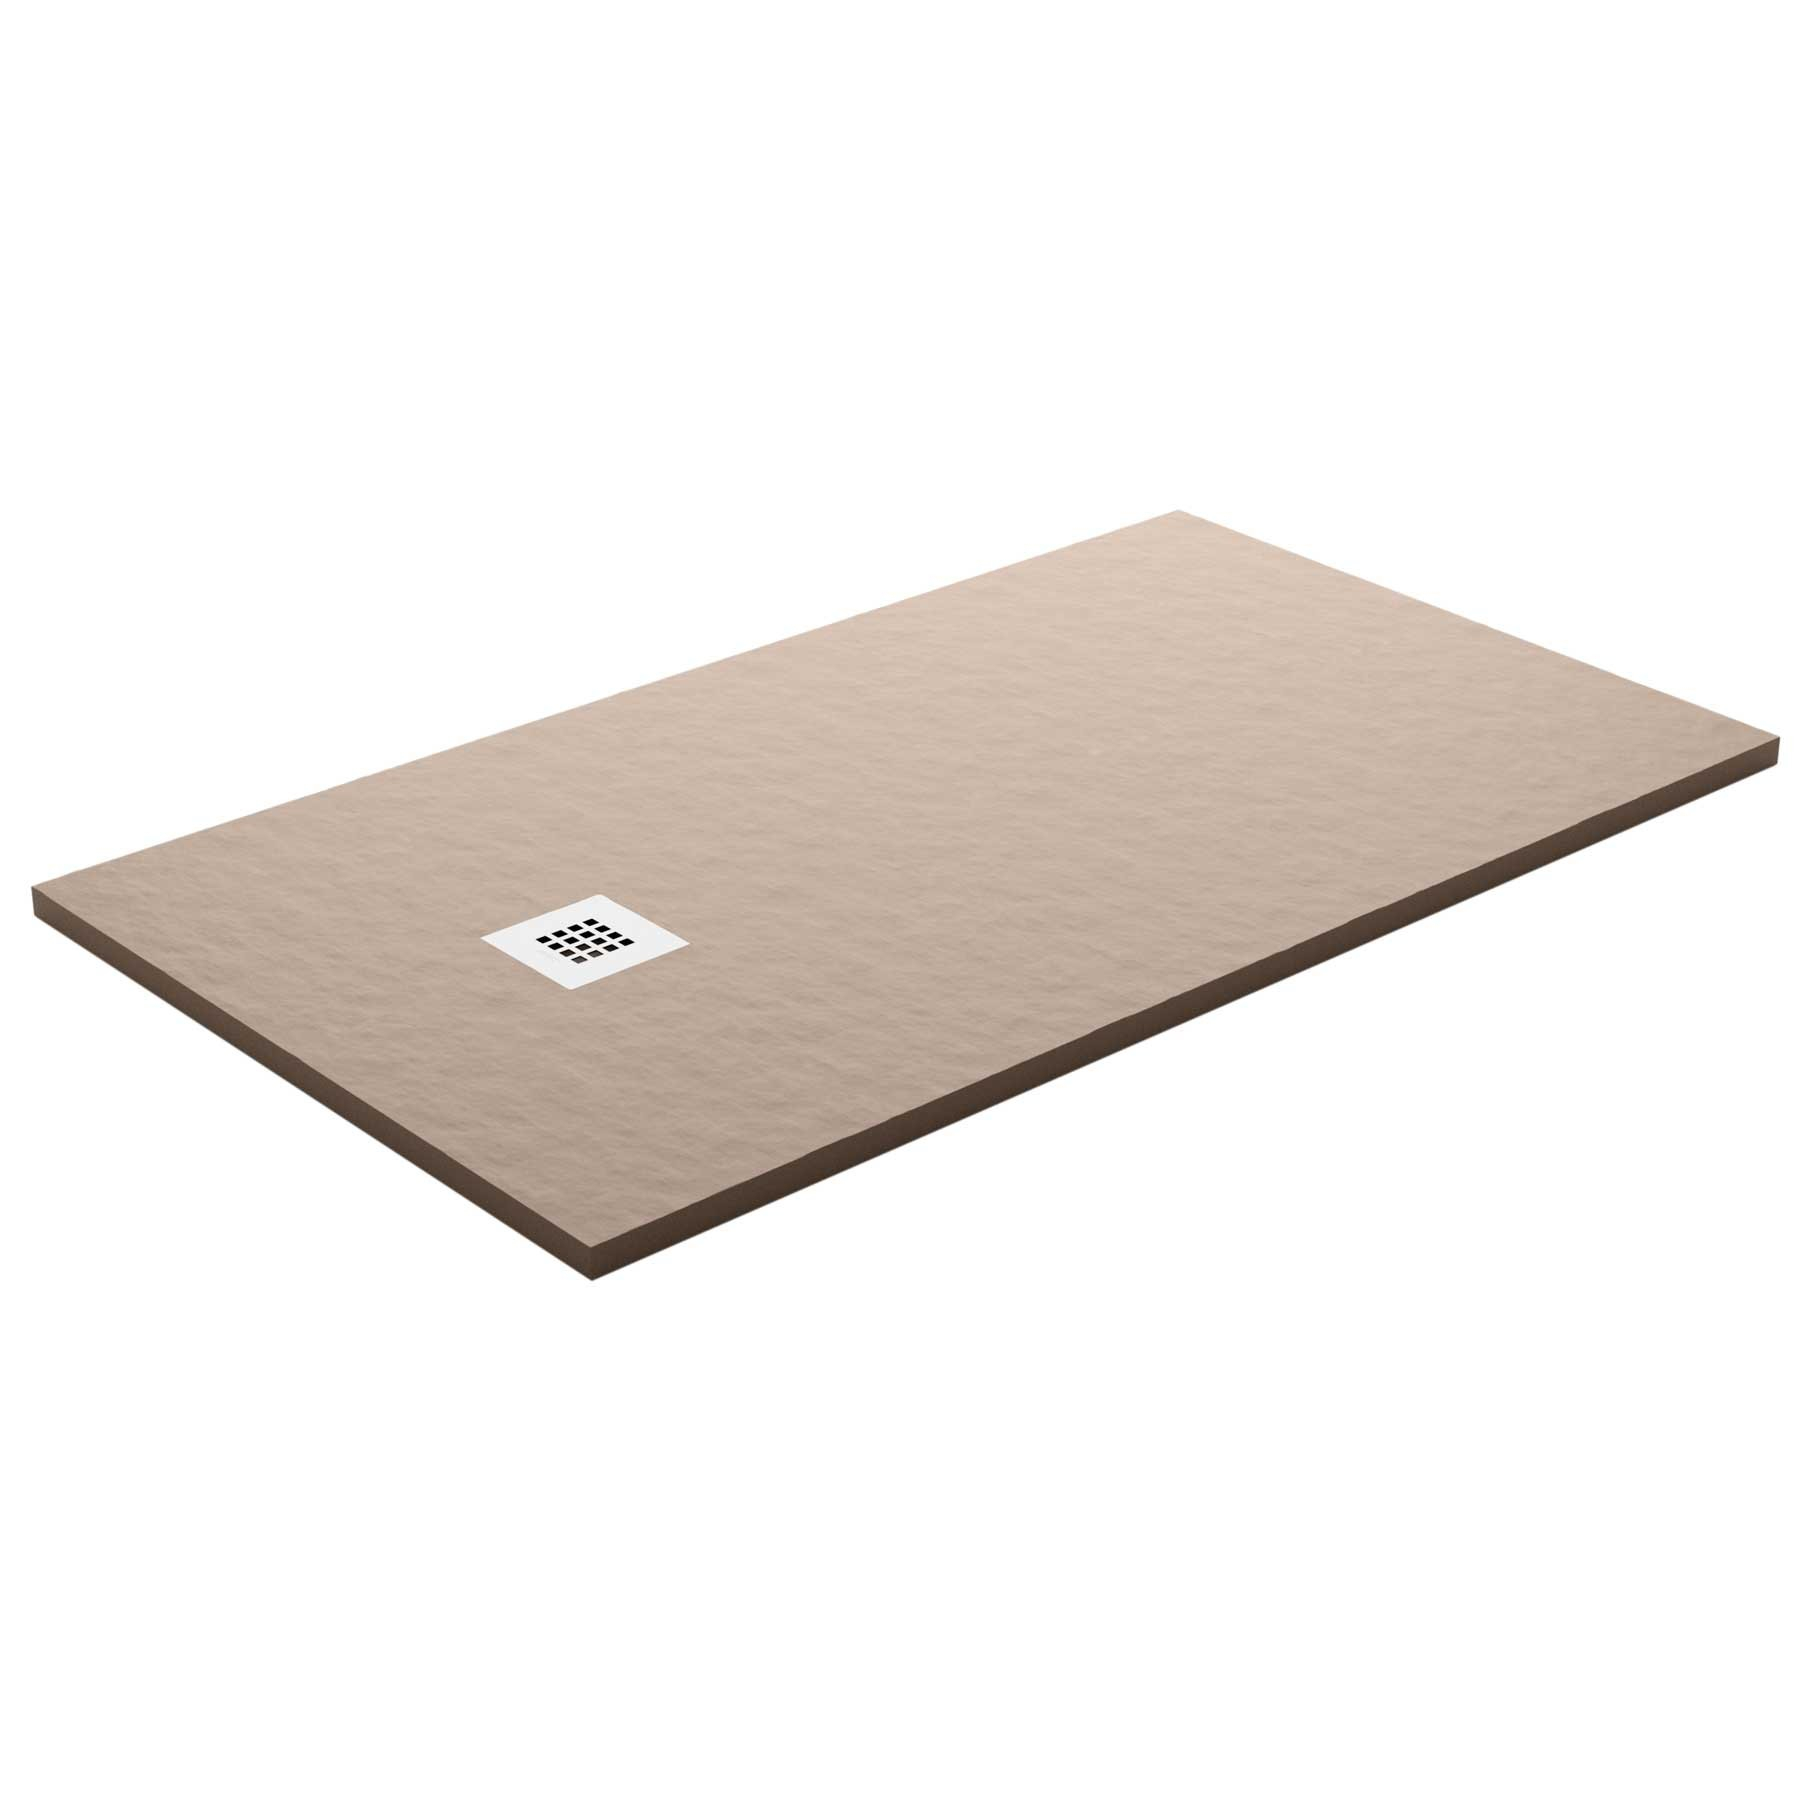 Productafbeelding van Muebles Rio douchebak 90x90cm taupe